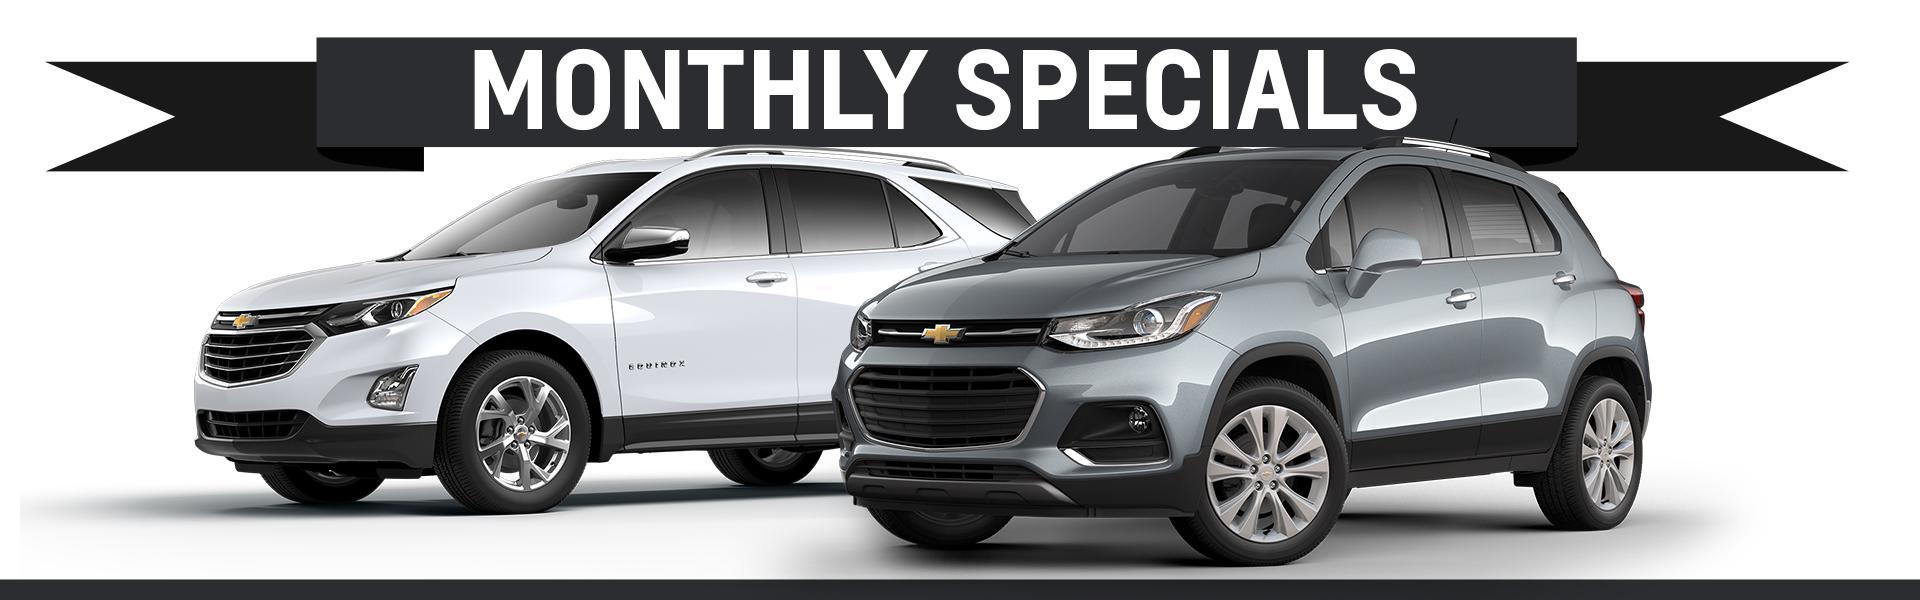 New Chevy Specials Deals In Bloomington Lupient Chevrolet